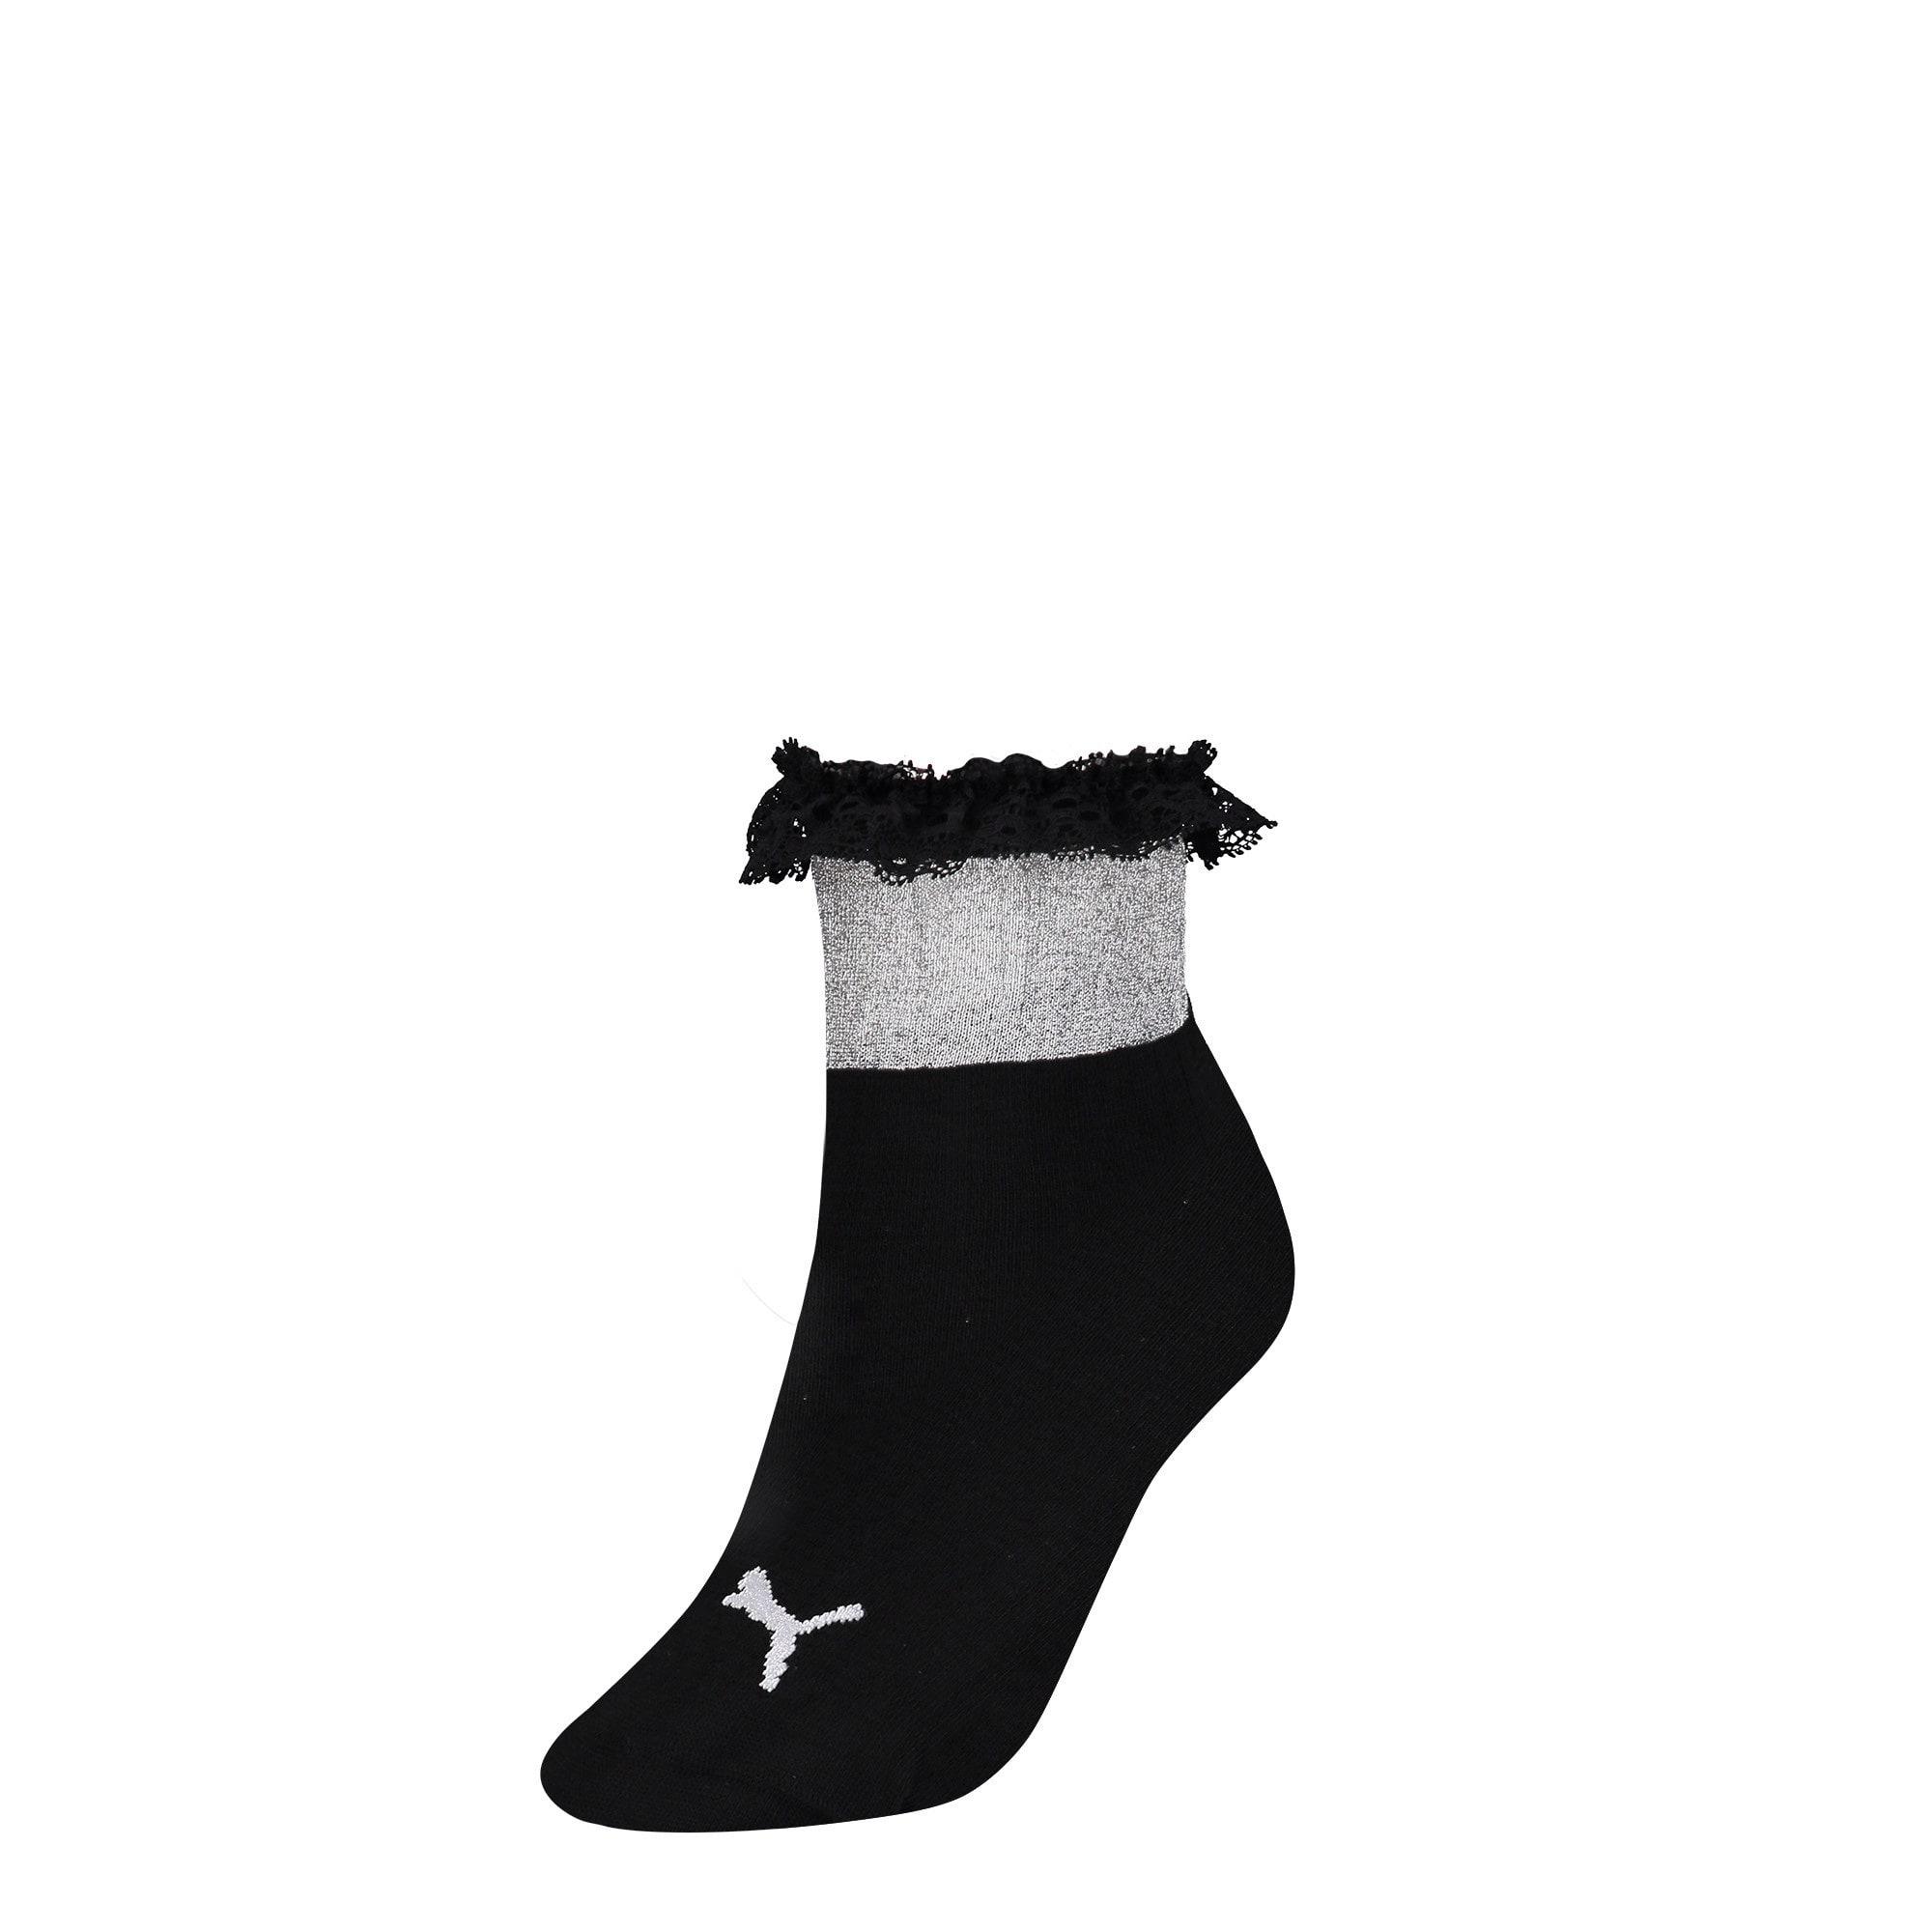 Thumbnail 1 of PUMA x SG Ruffle Short Crew Socks, black, medium